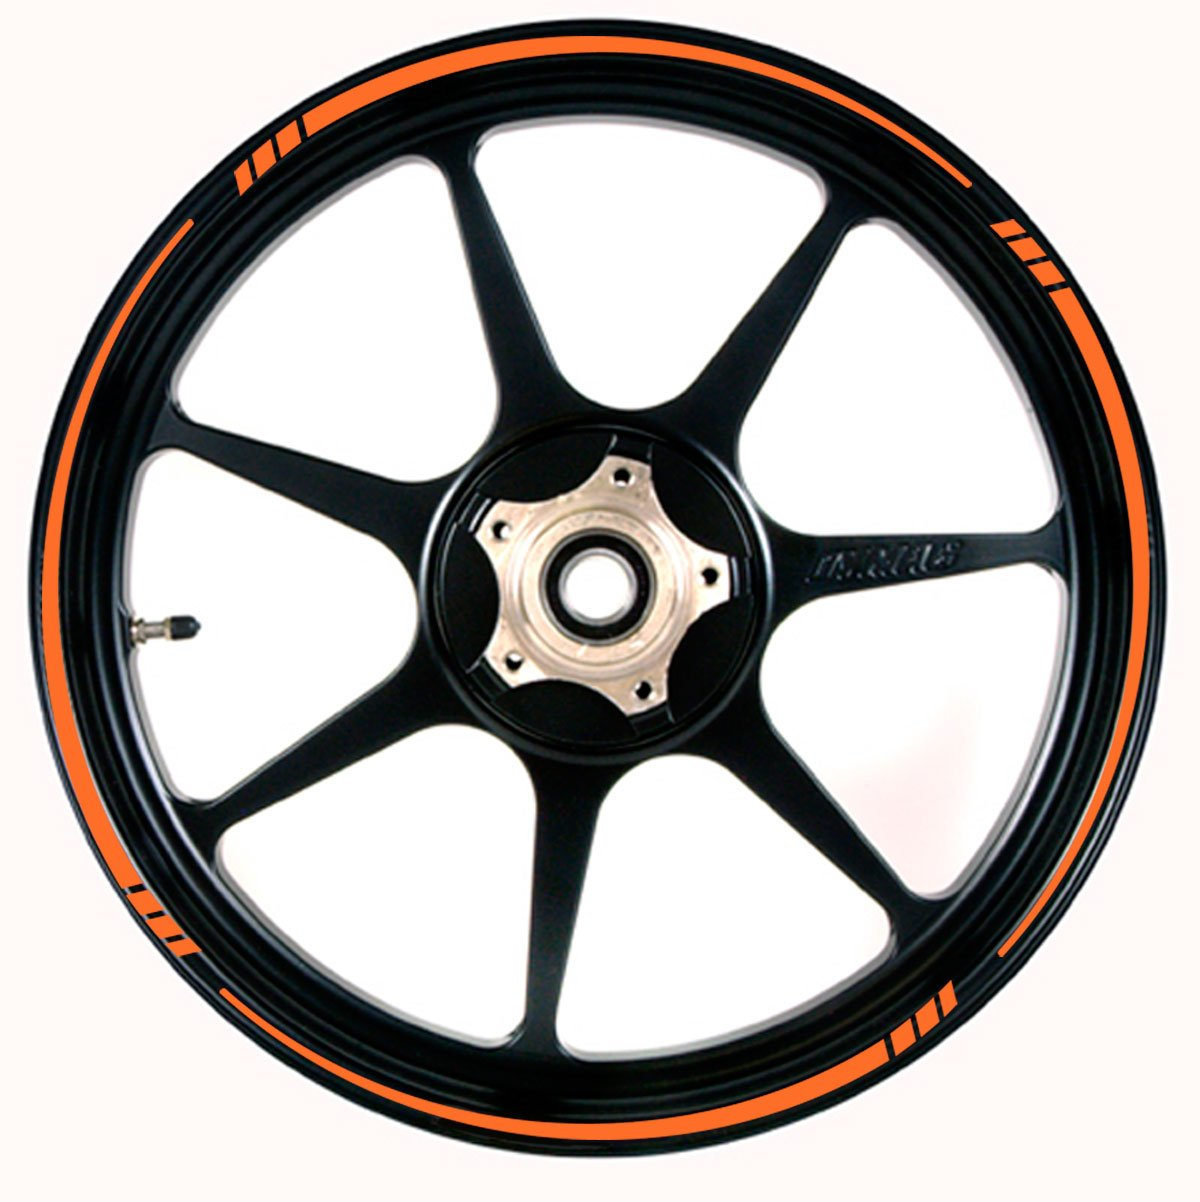 ORANGE Wheel Rim Tape SPEED TAPERED Stripe fit ALL Makes of Motorcycles, Cars, Trucks